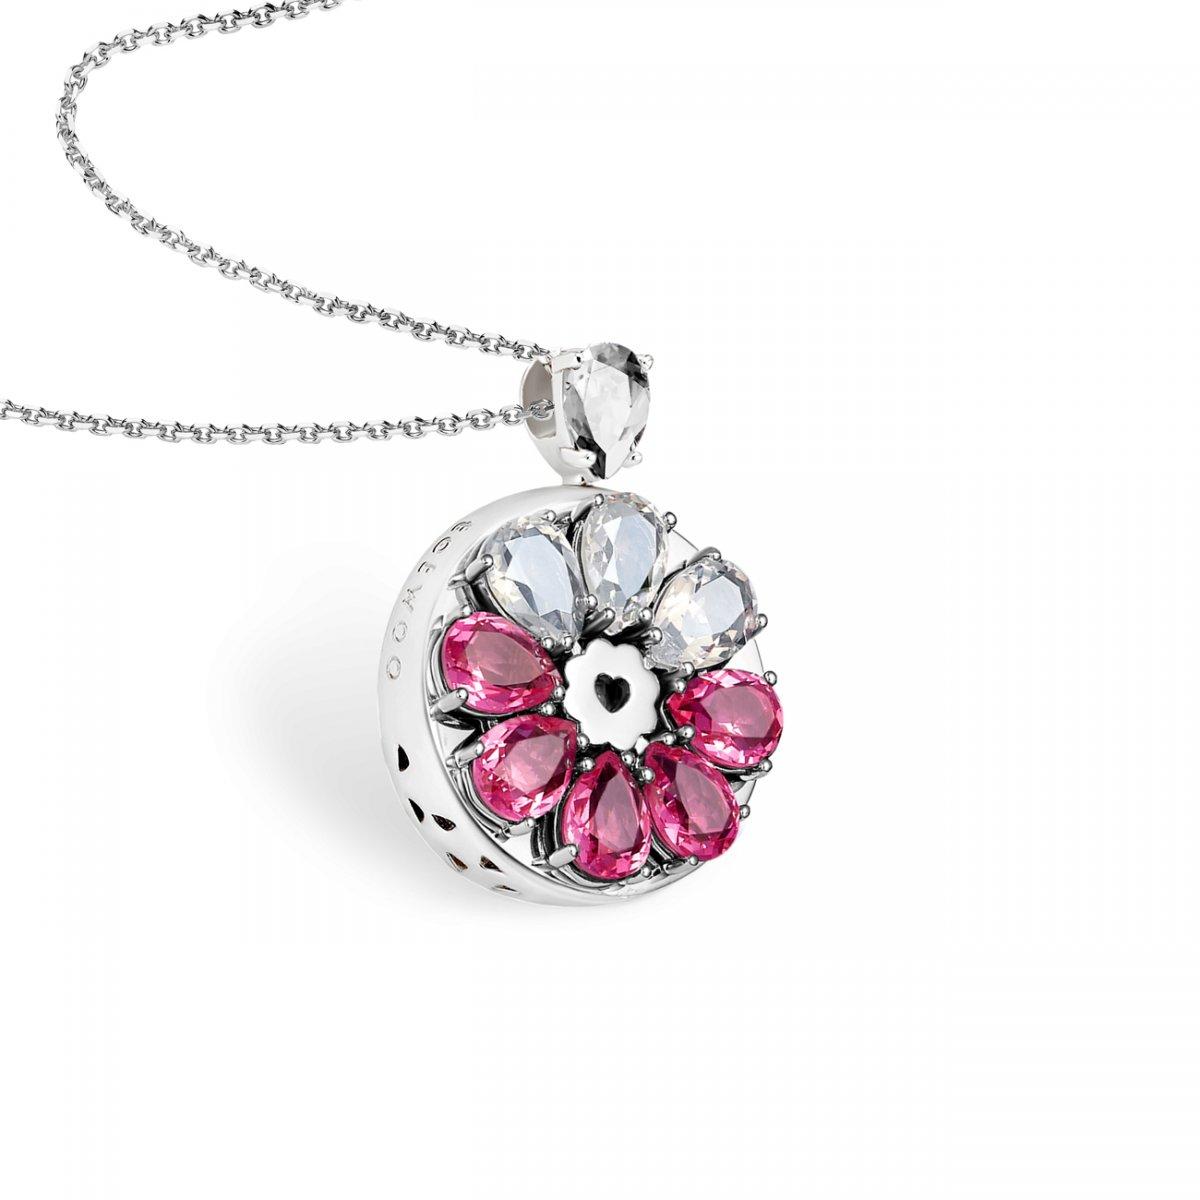 Swarovski necklace necklace